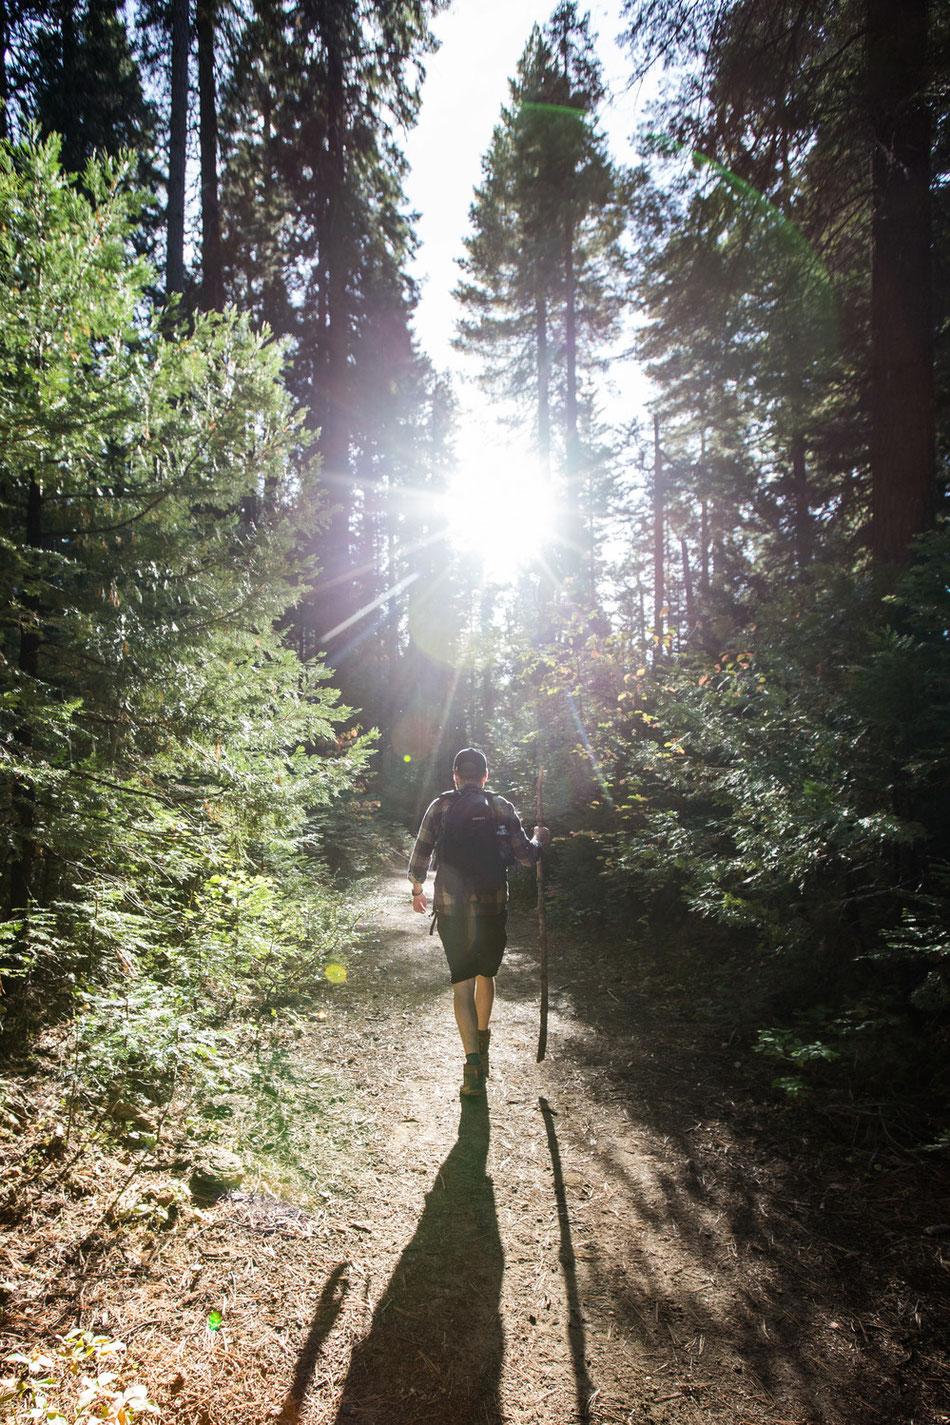 Wandern in der Nähe des Yosemite National Parks